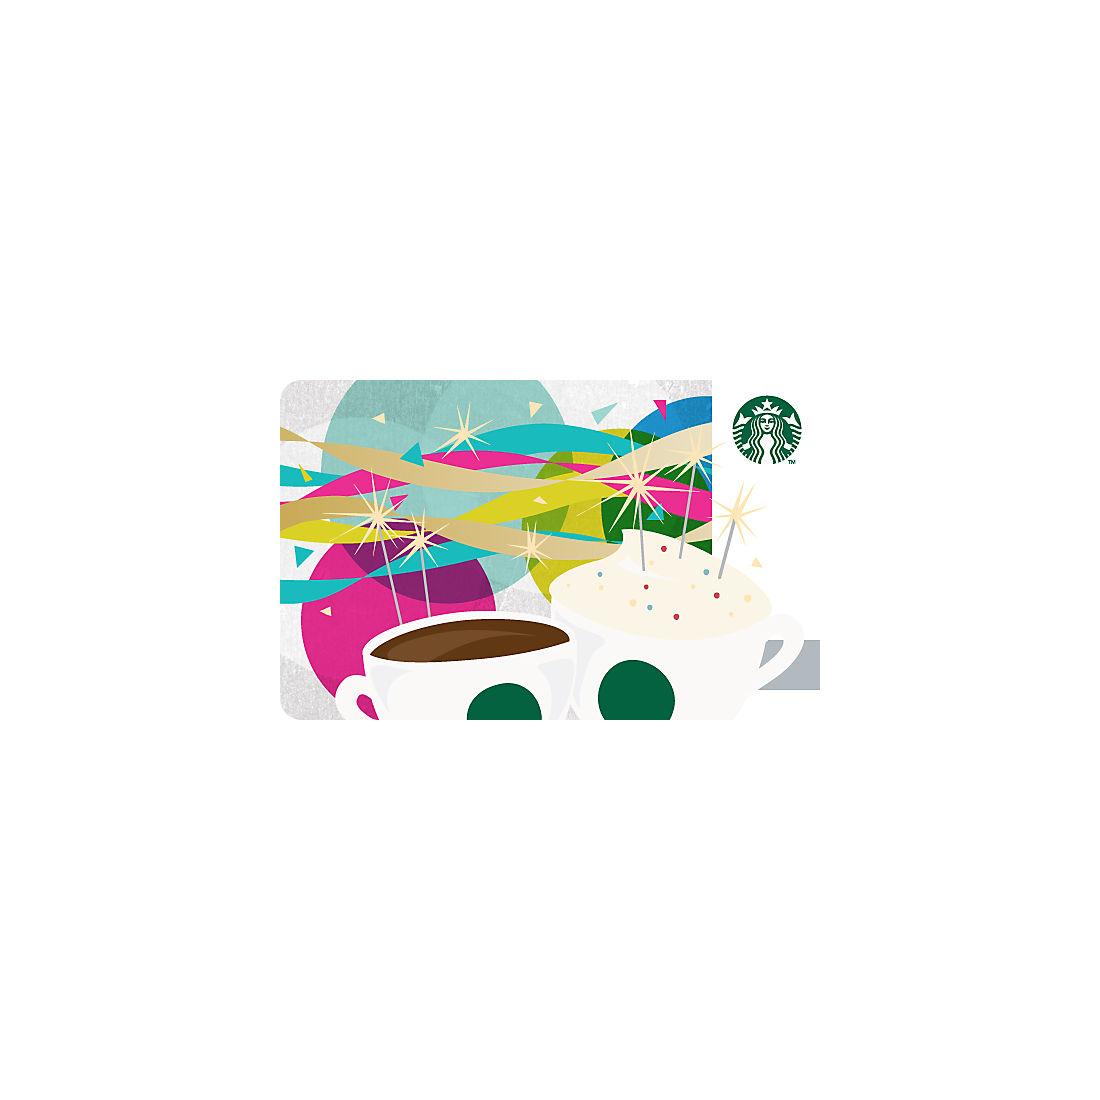 $7 Starbucks Gift Card - Happy Birthday